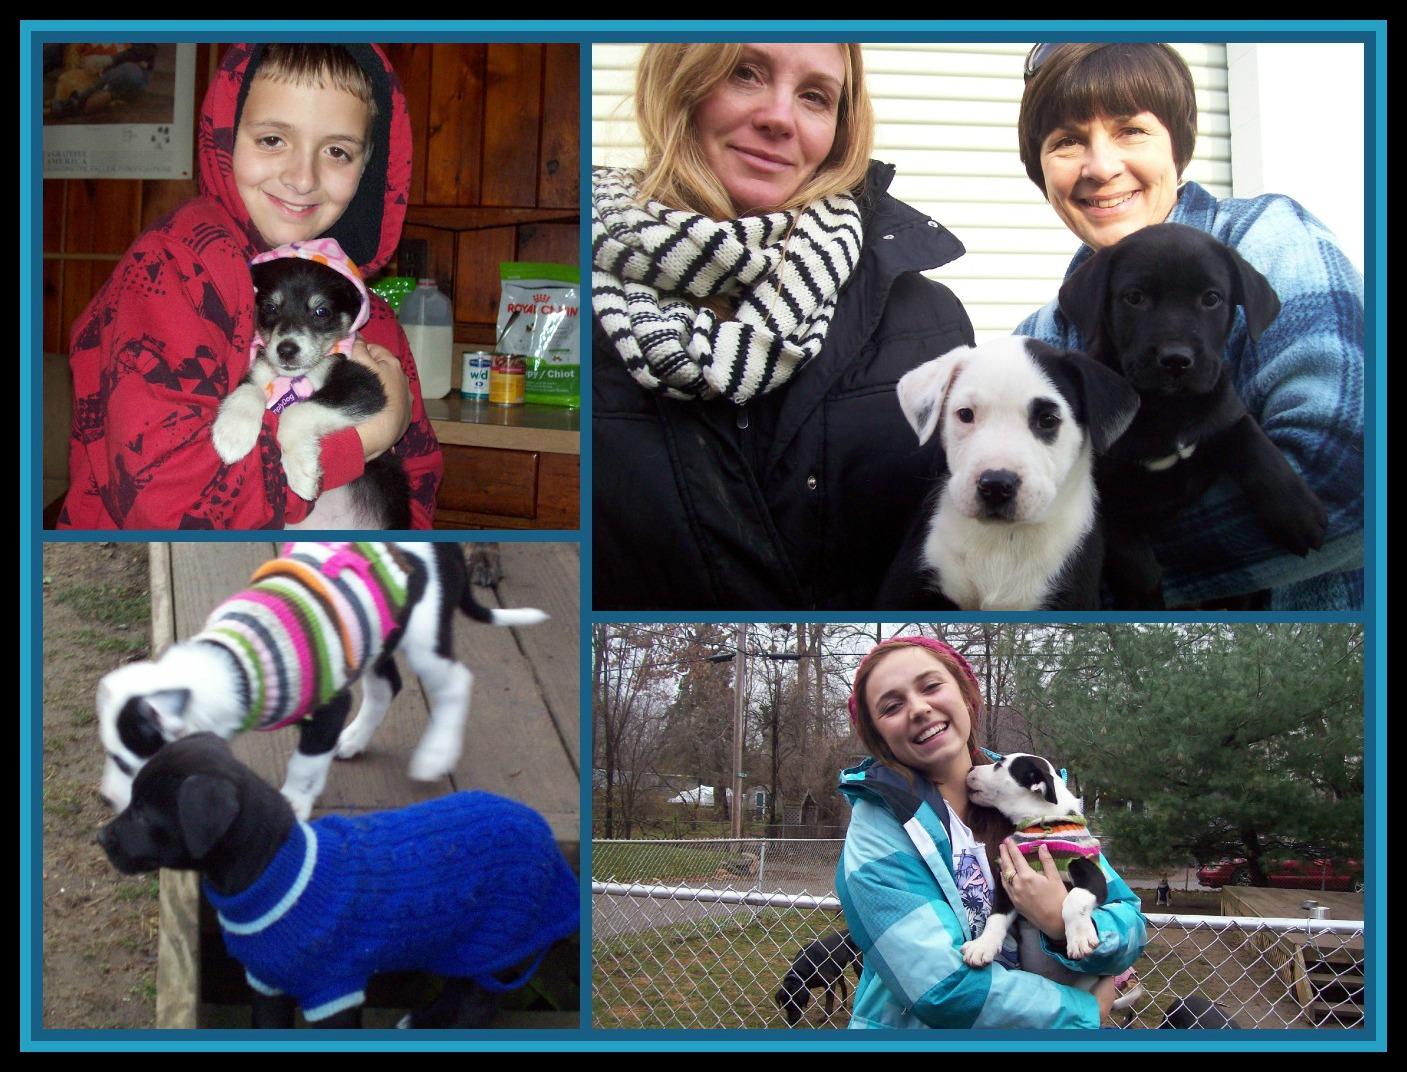 December 16 PicMonkey Collage